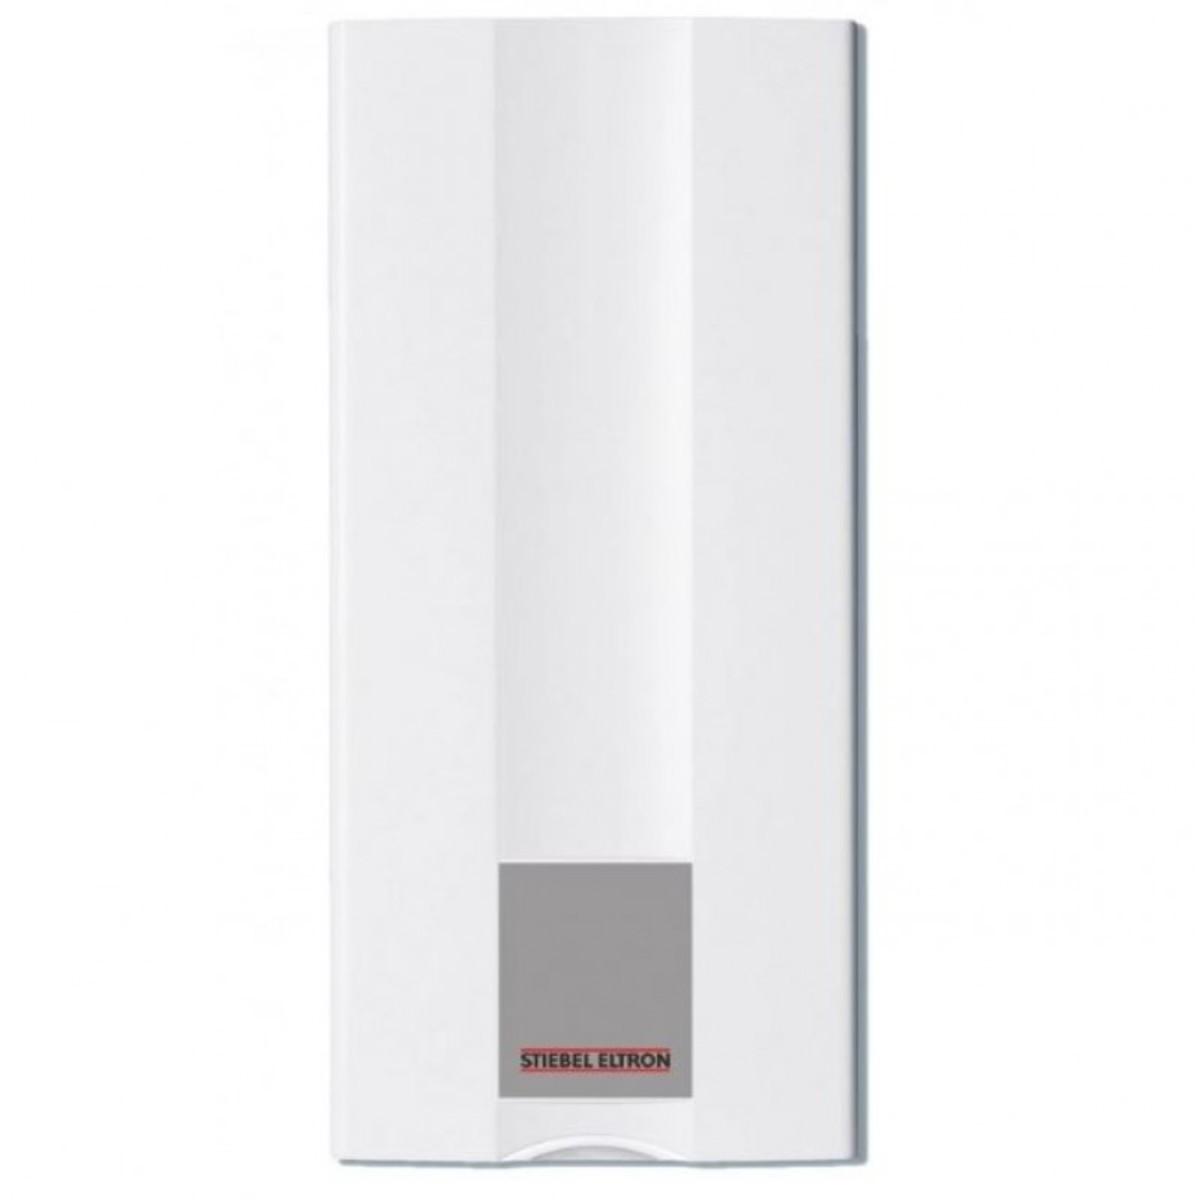 HDB-E18Si 18000W Electronic Control Water Heater  Hong Kong Warranty Genuine Products